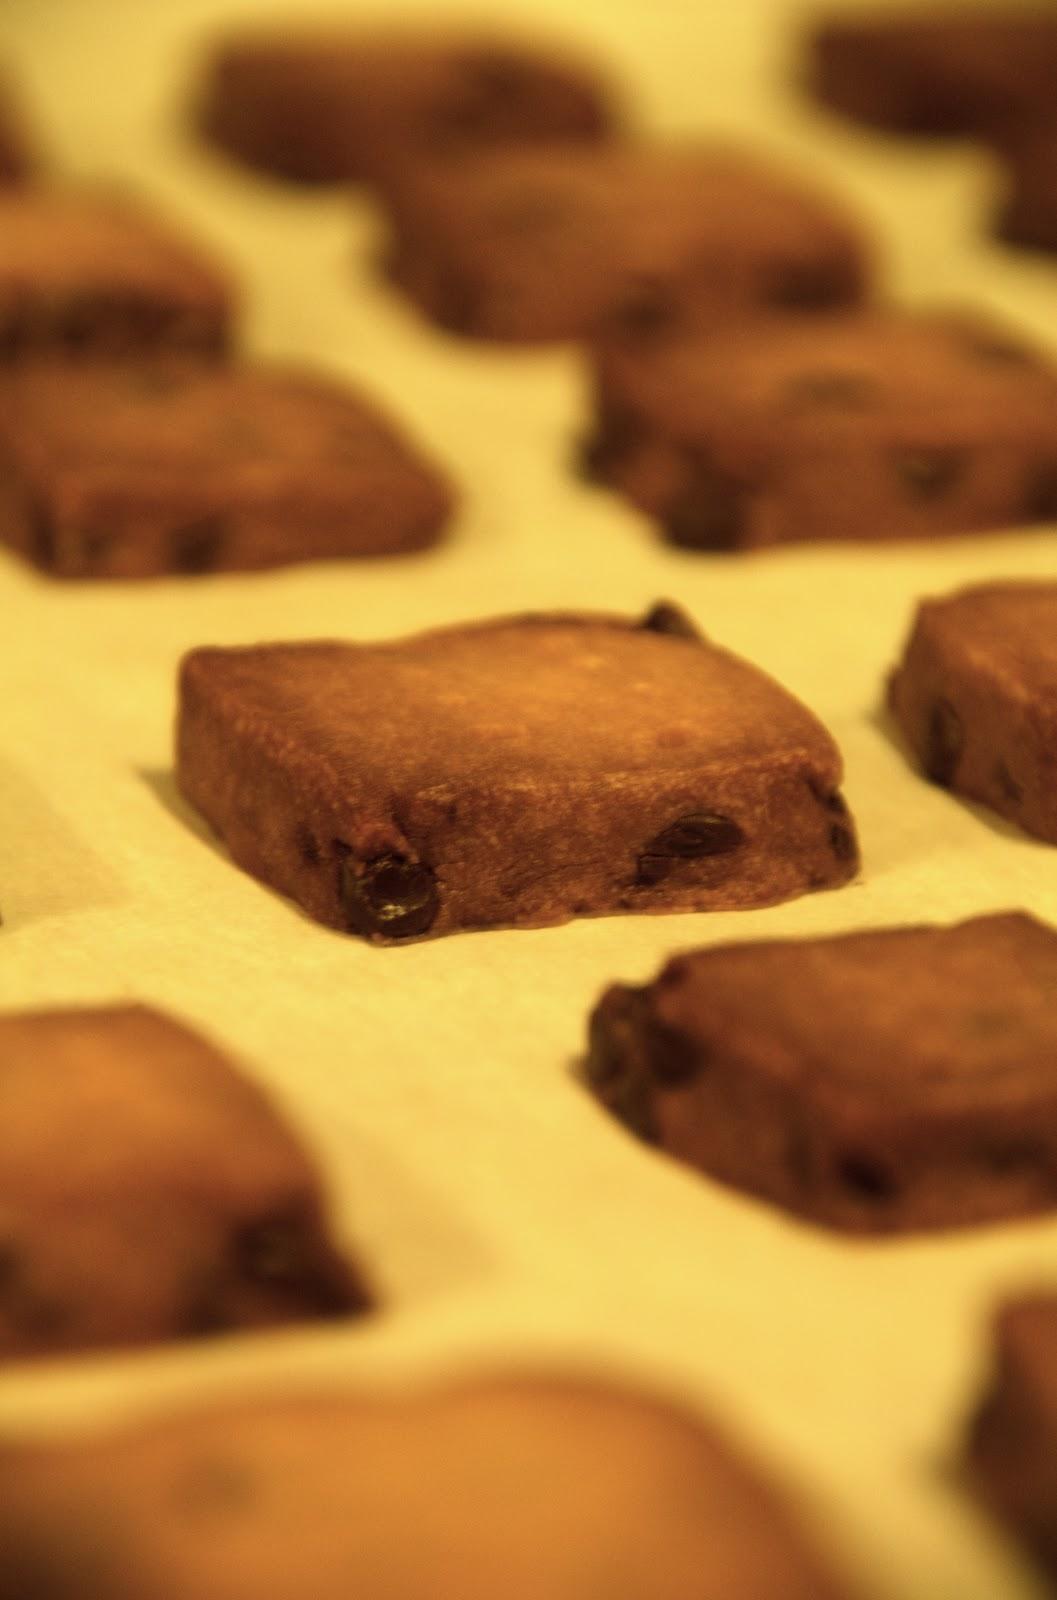 ... : Christmas Bliss: Espresso-Chocolate Shortbread Cookies